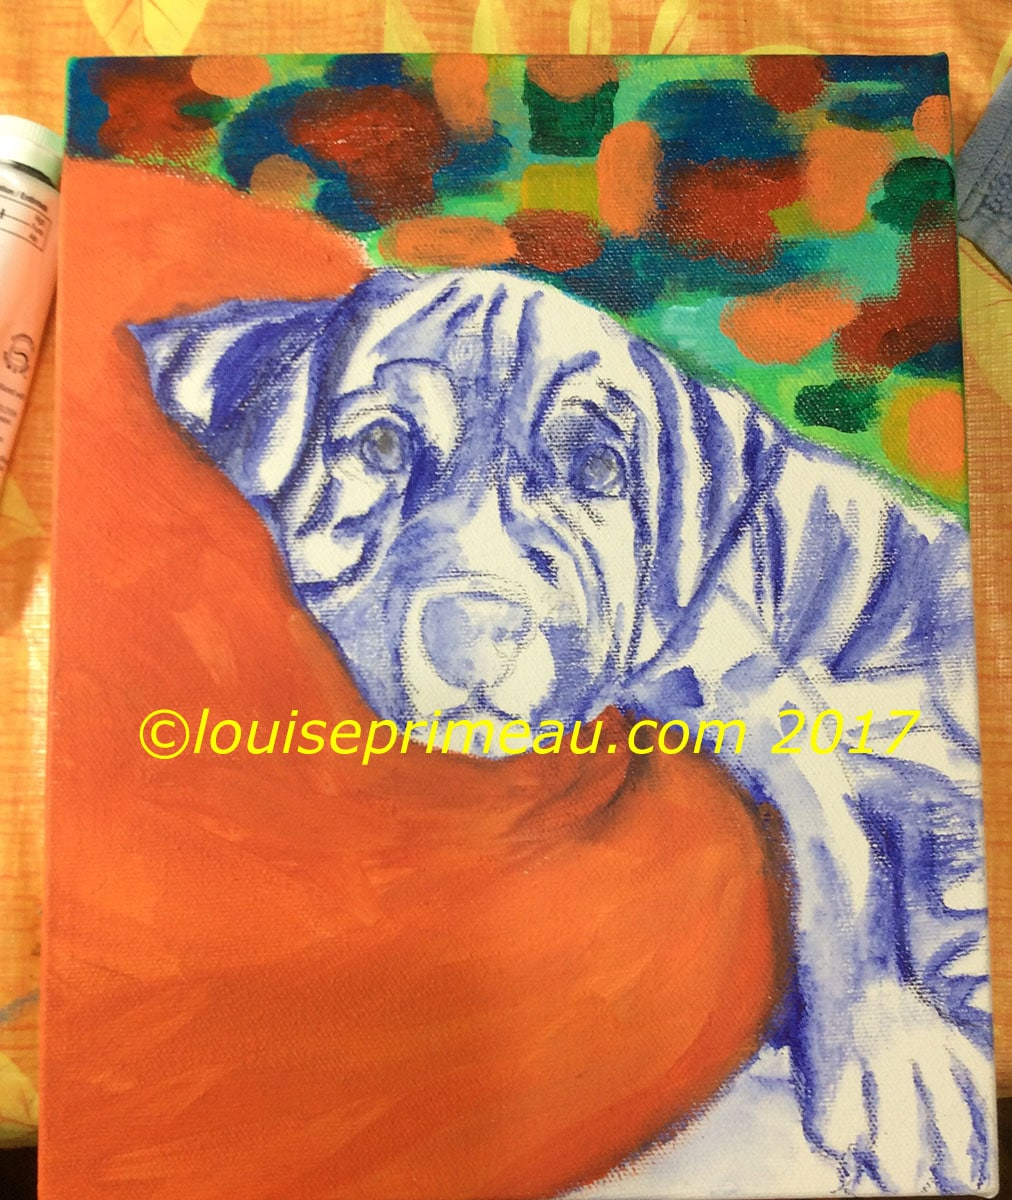 Adding huge blocks of colour to dog sketch